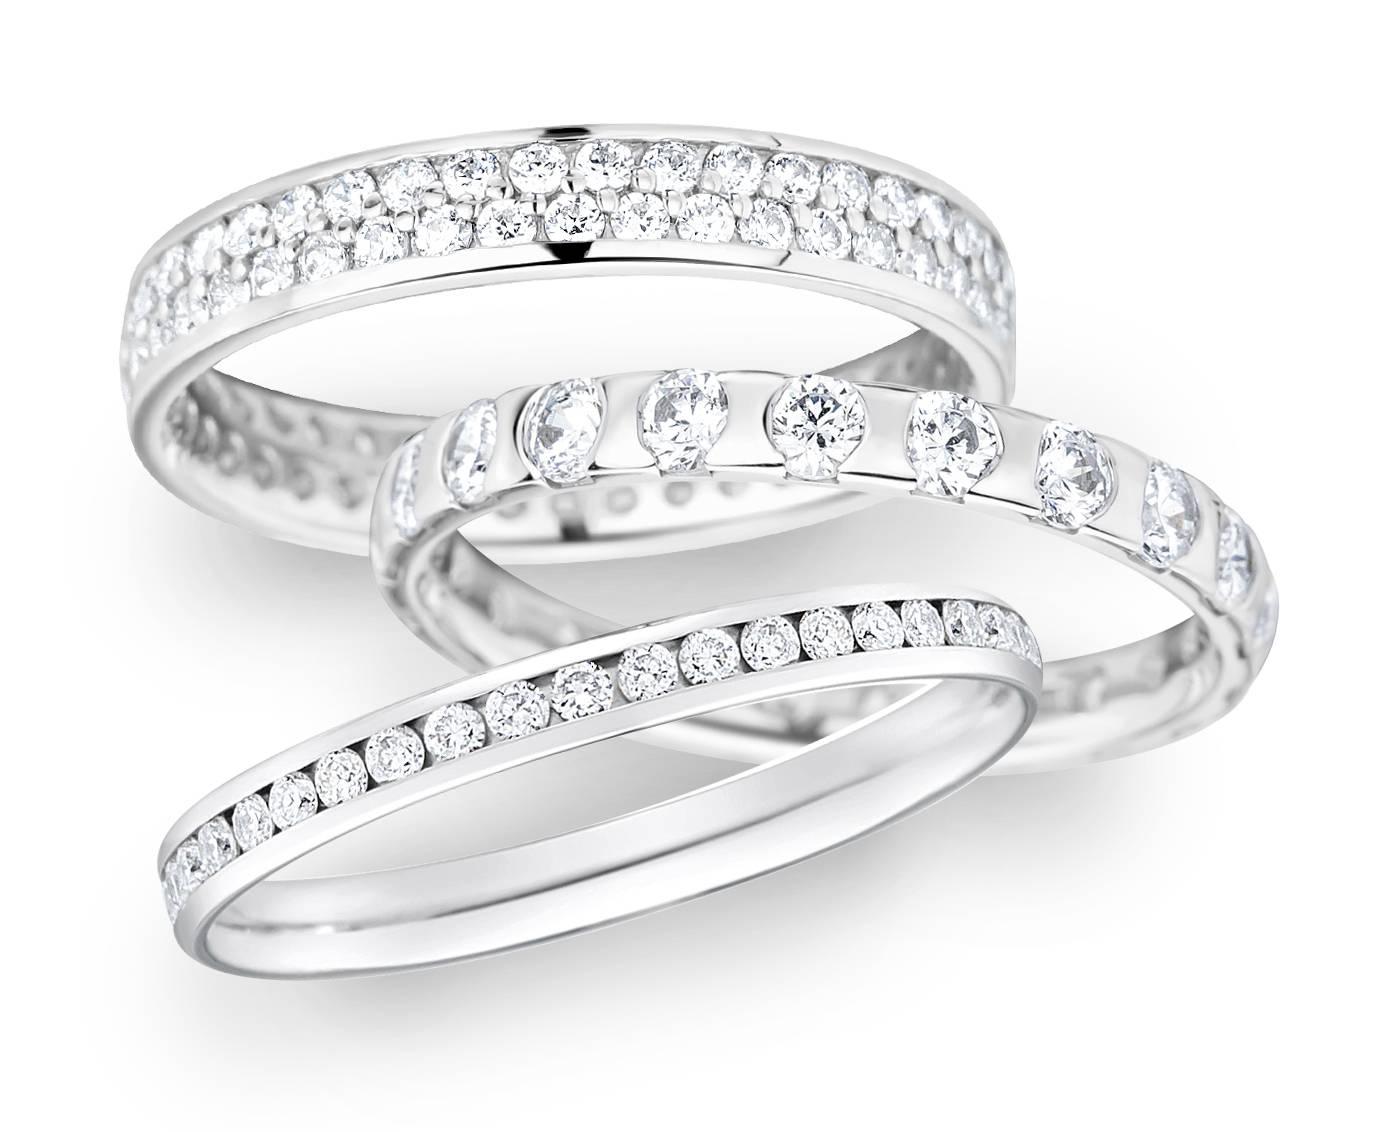 Wedding Rings : Diamond Wedding Rings For Him And Her Diamond Inside Diamonds Wedding Rings (View 15 of 15)